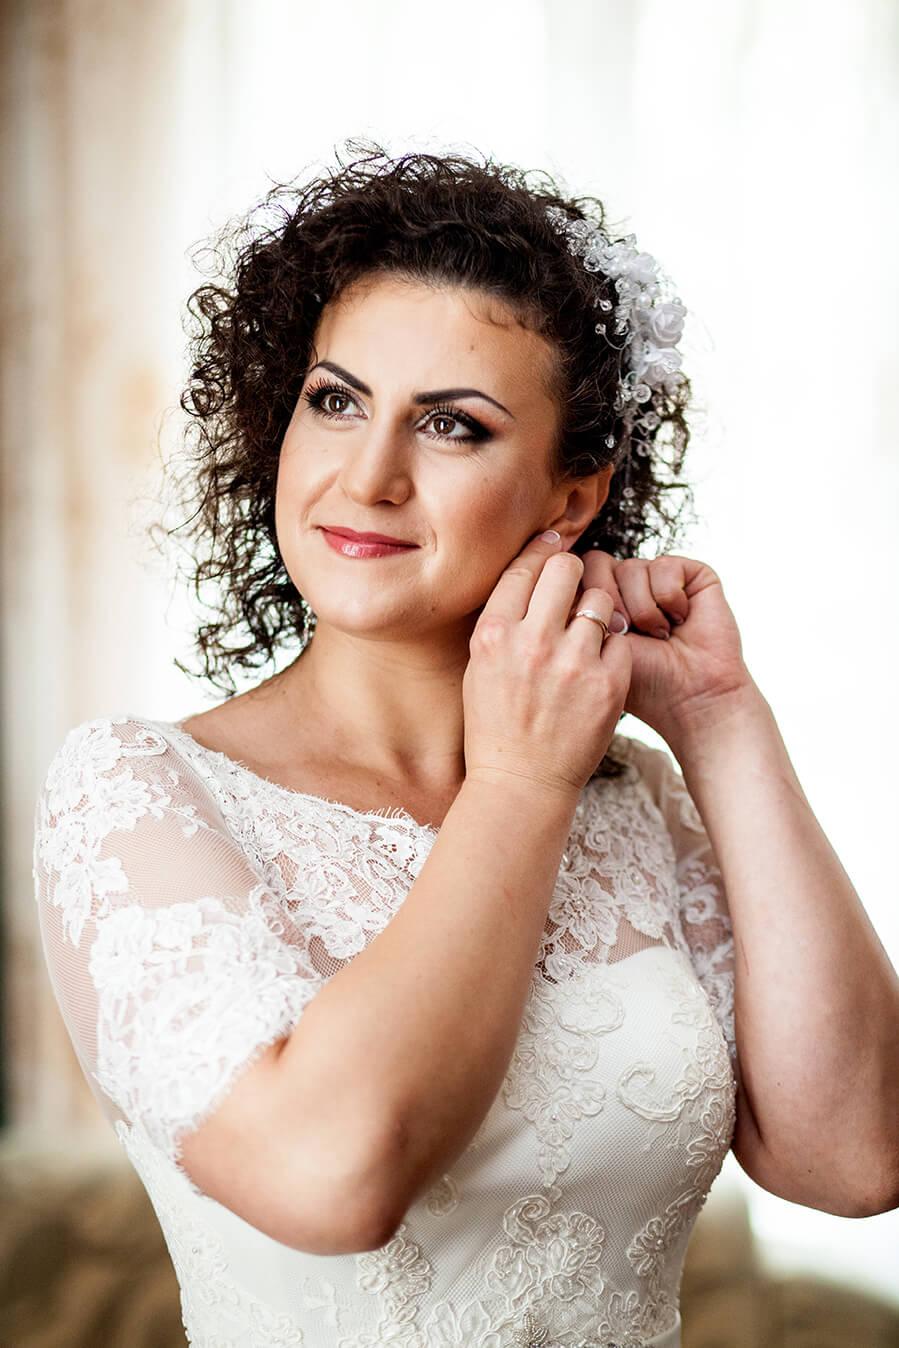 2-svadebnyj-fotograf-videooperator-svadebnoe-foto-utro-nevesty-idei-kiev-2